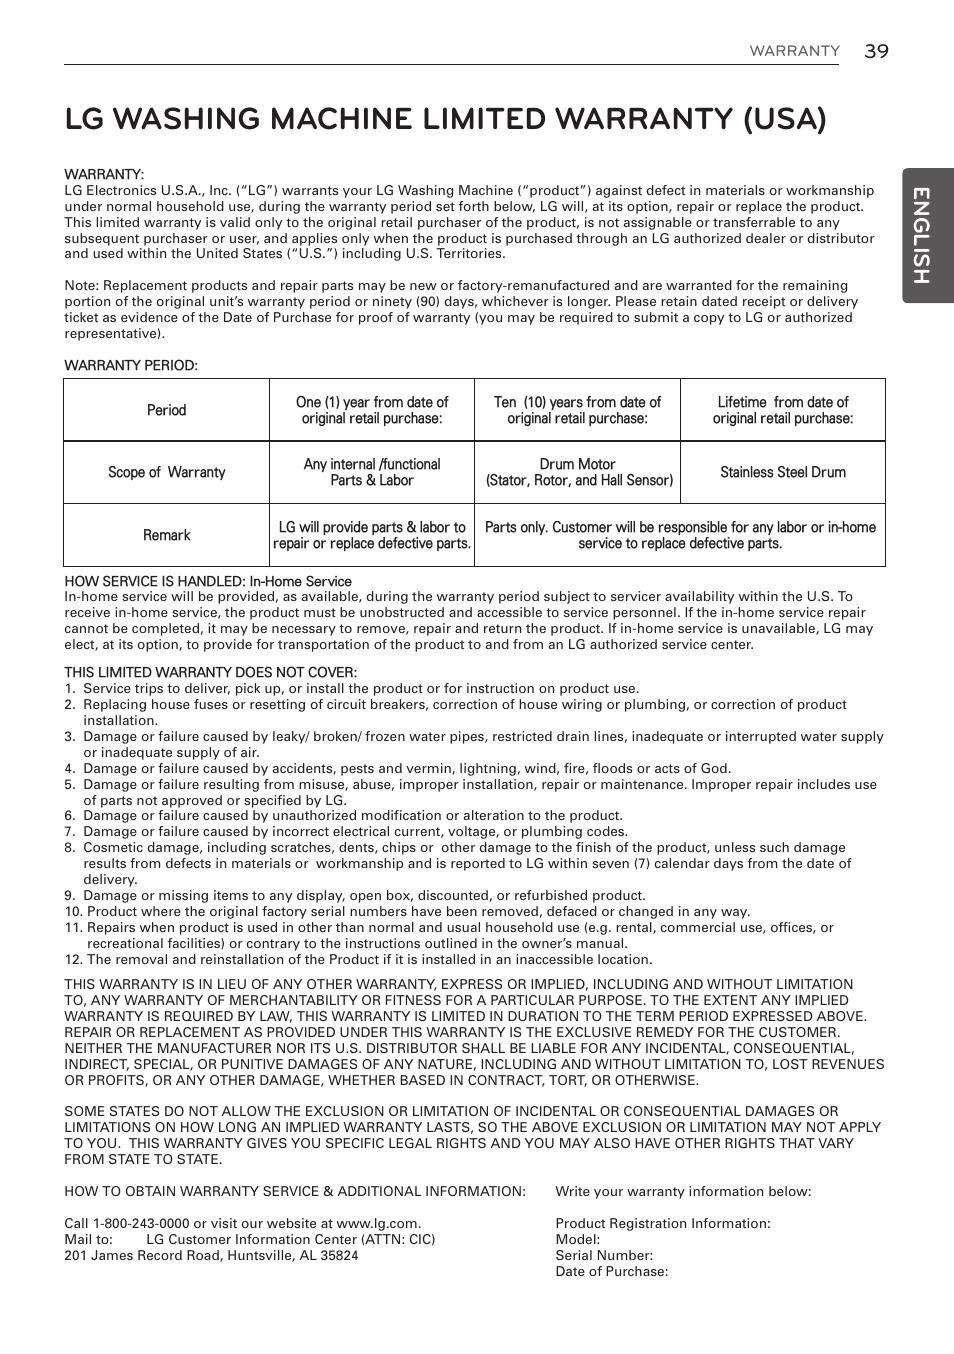 Lg washing machine limited warranty (usa), English   LG WM3997HWA User  Manual  